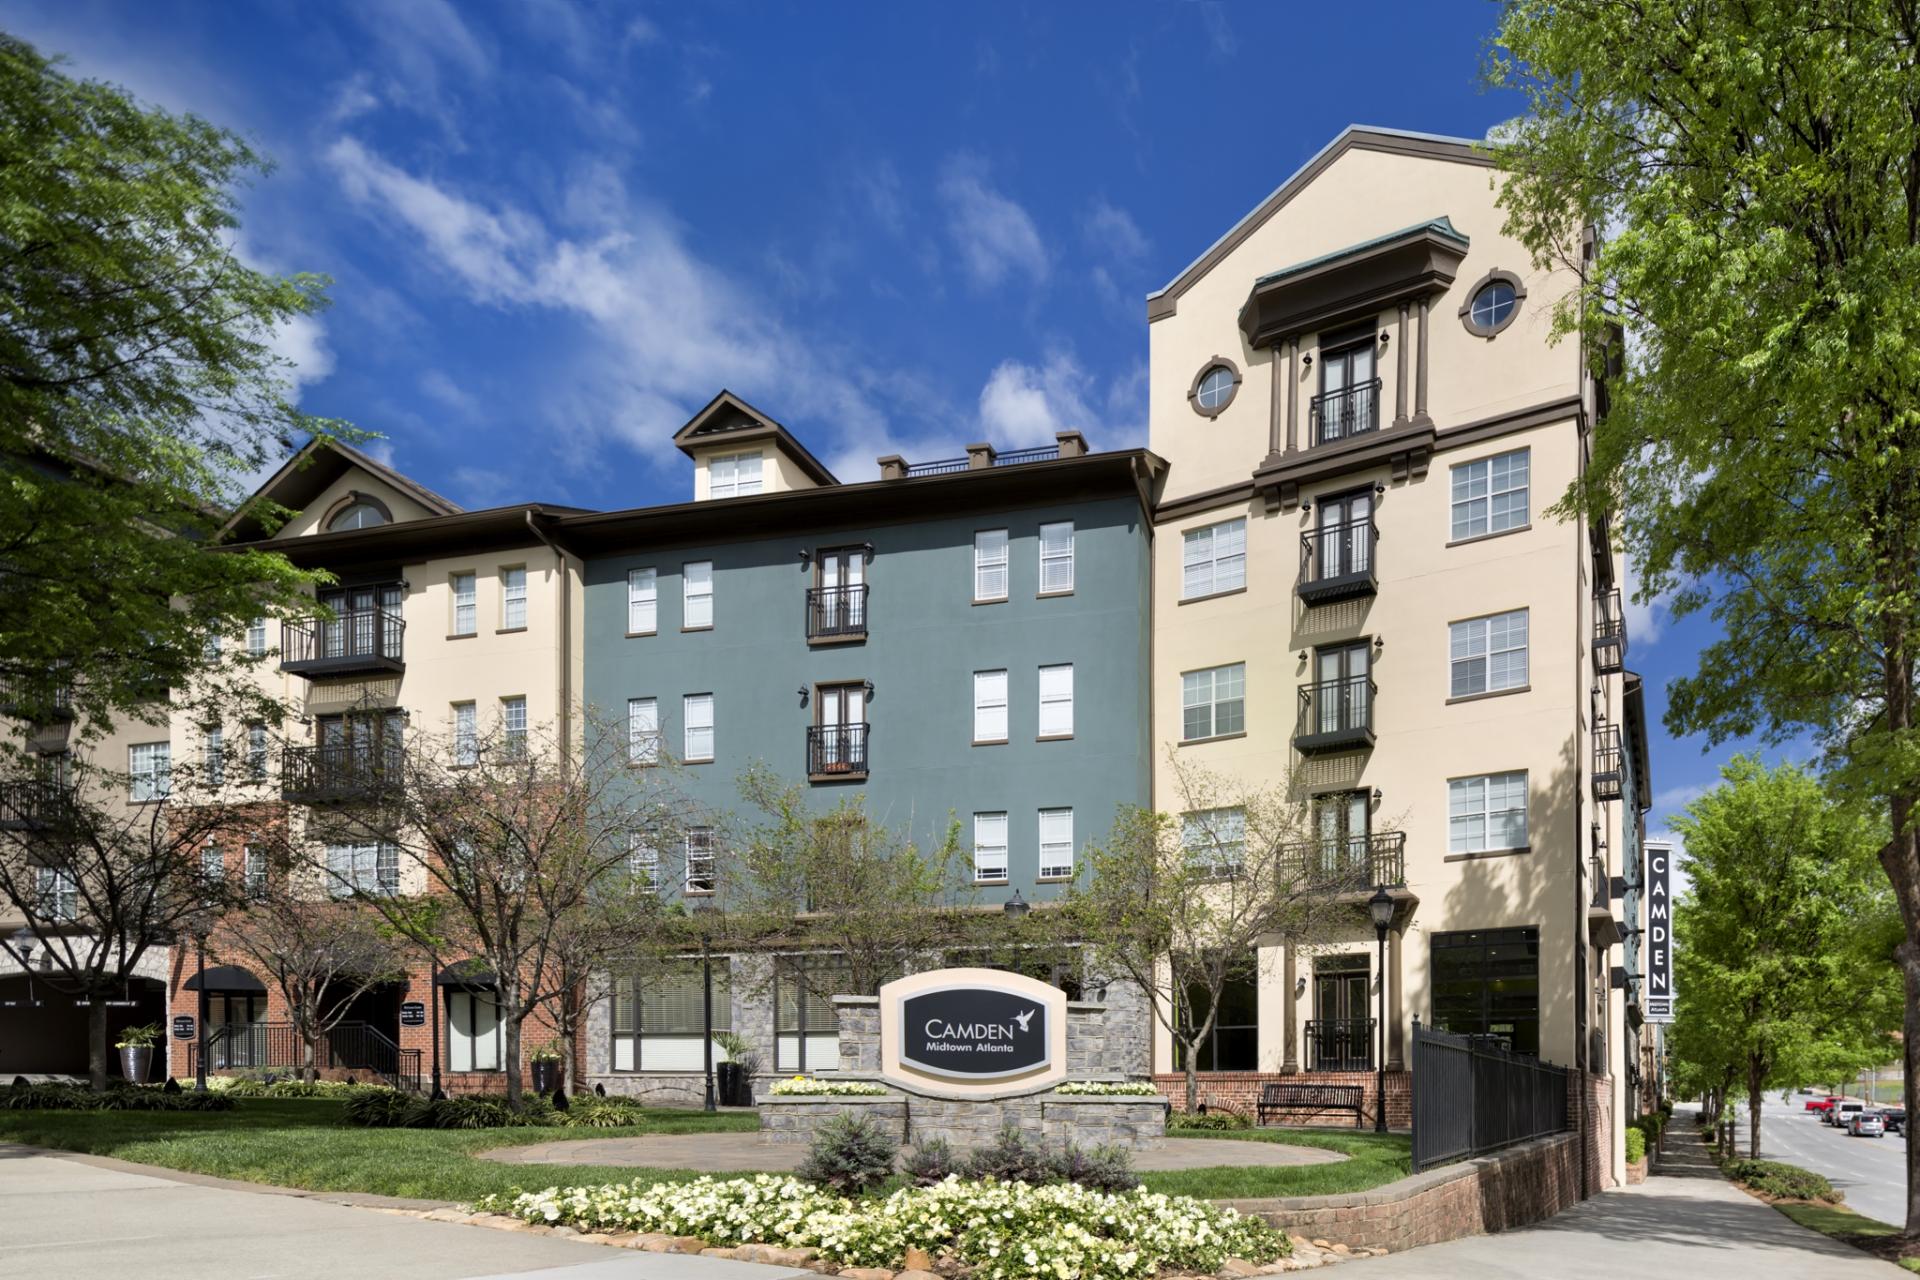 Camden Midtown Atlanta Apartments image 16